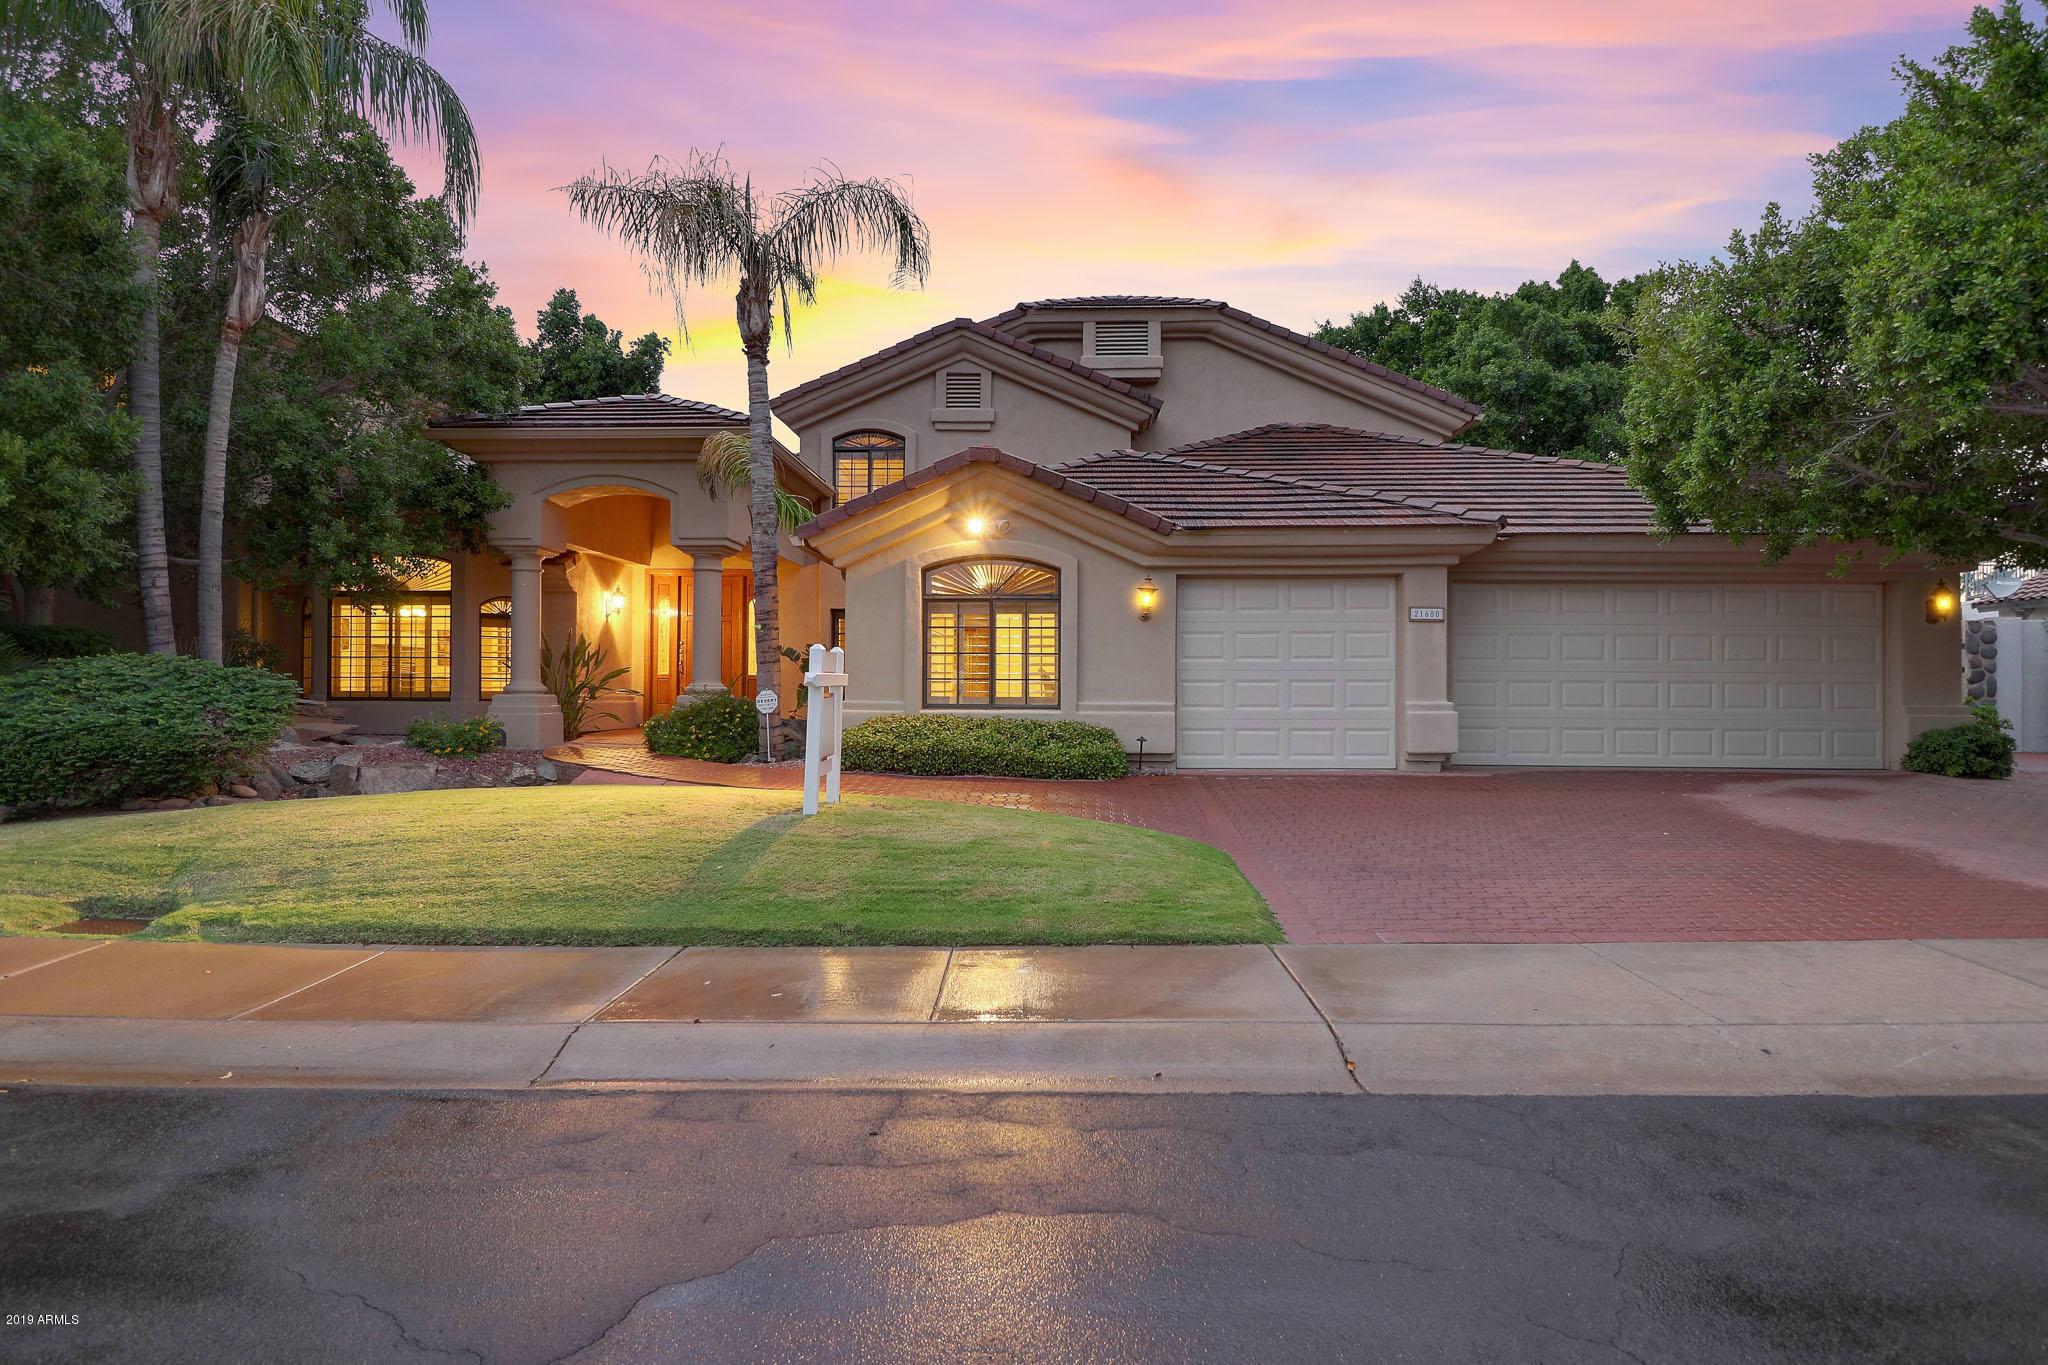 Photo of 21680 N 56TH Avenue, Glendale, AZ 85308